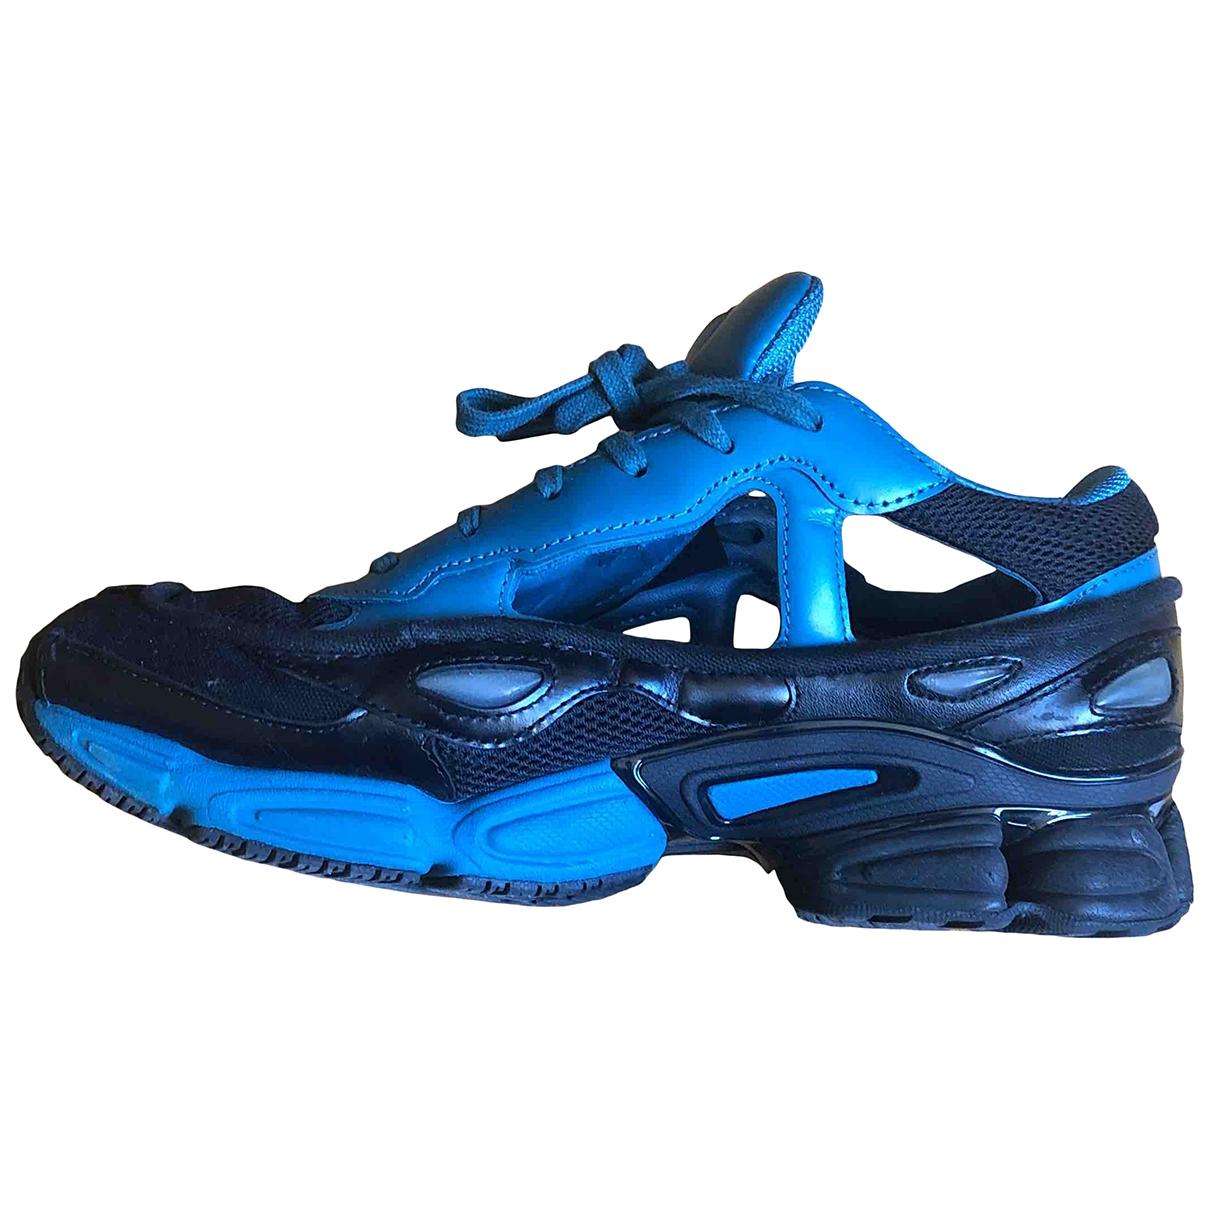 Adidas X Raf Simons - Baskets RS Ozweego pour homme en cuir - bleu